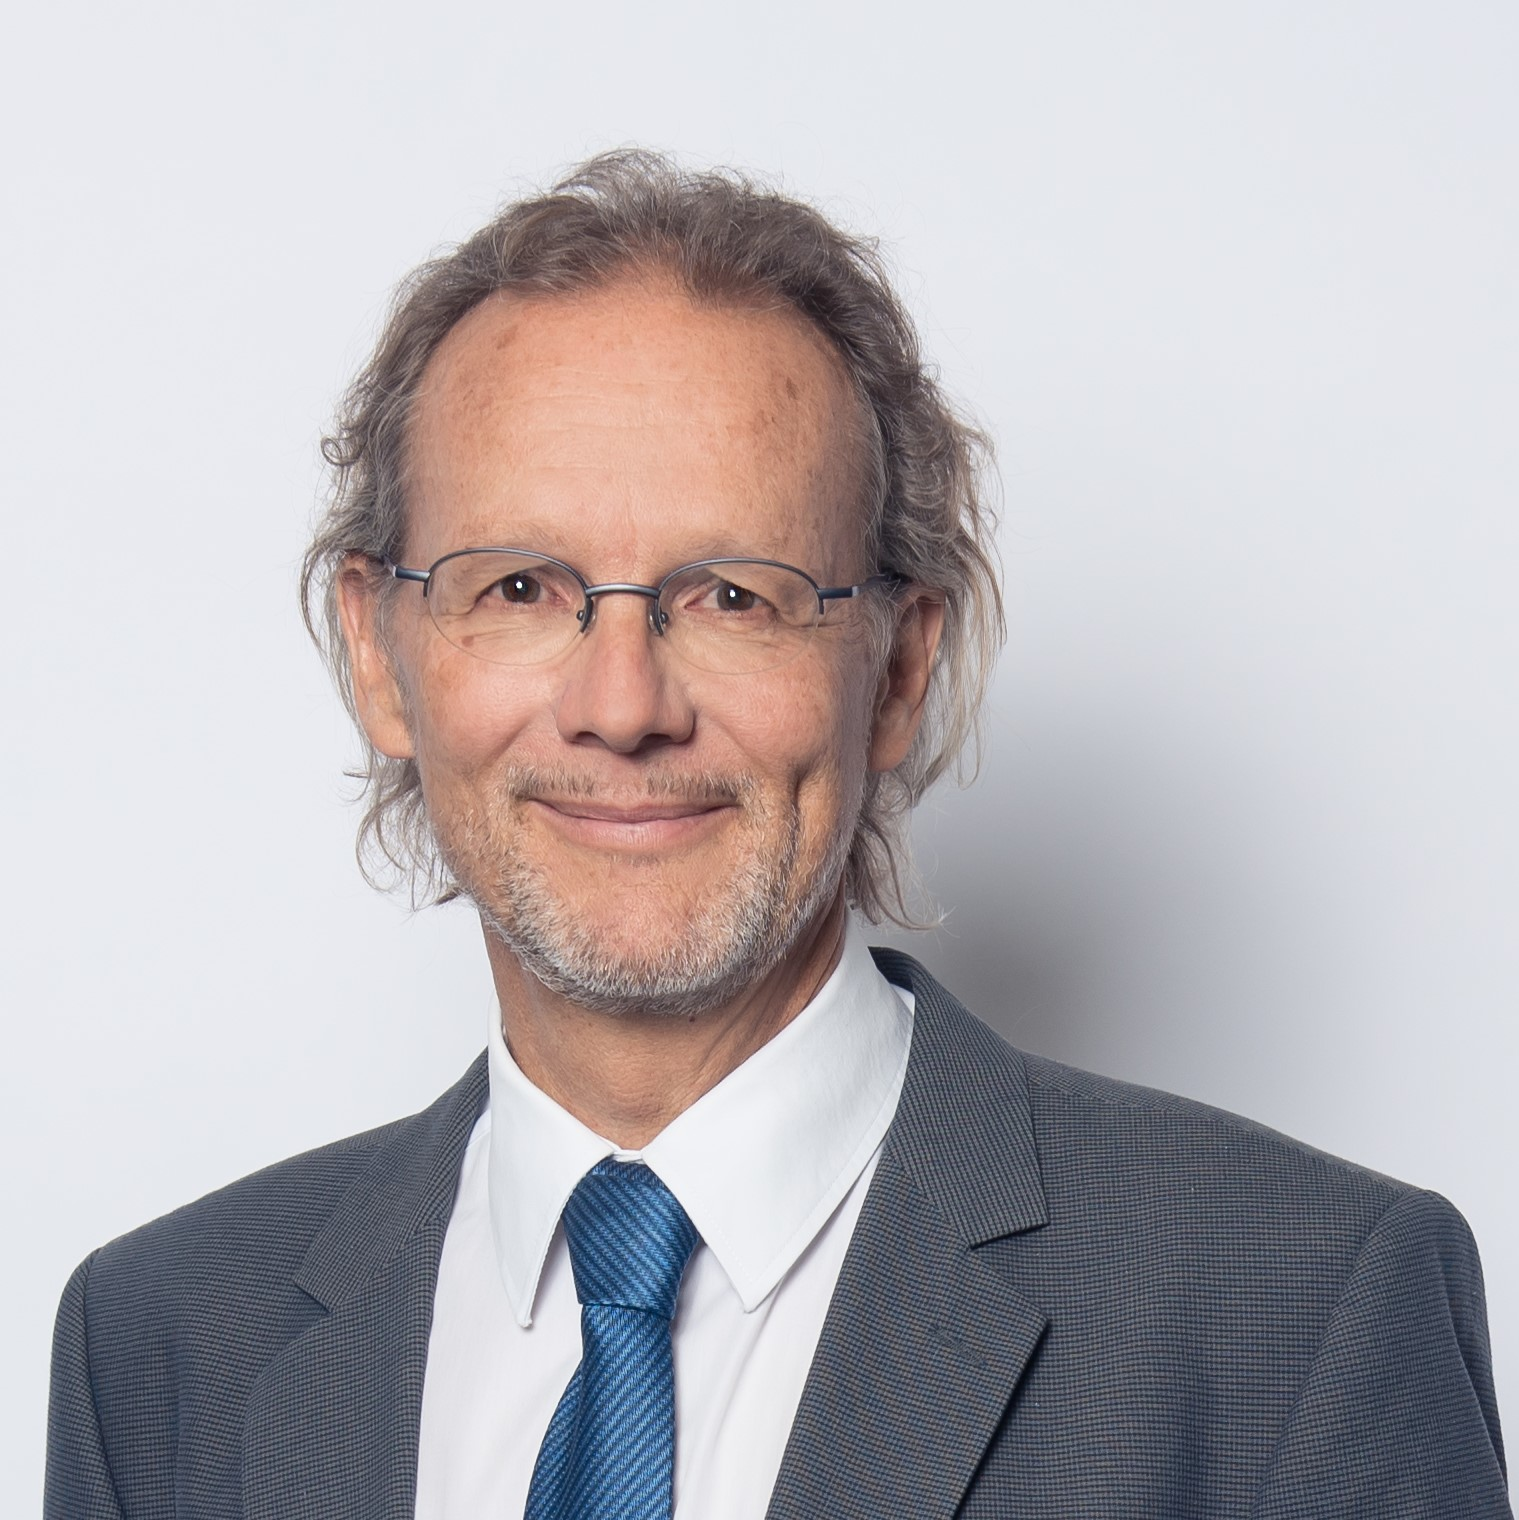 Peter Mäusli-Allenspach